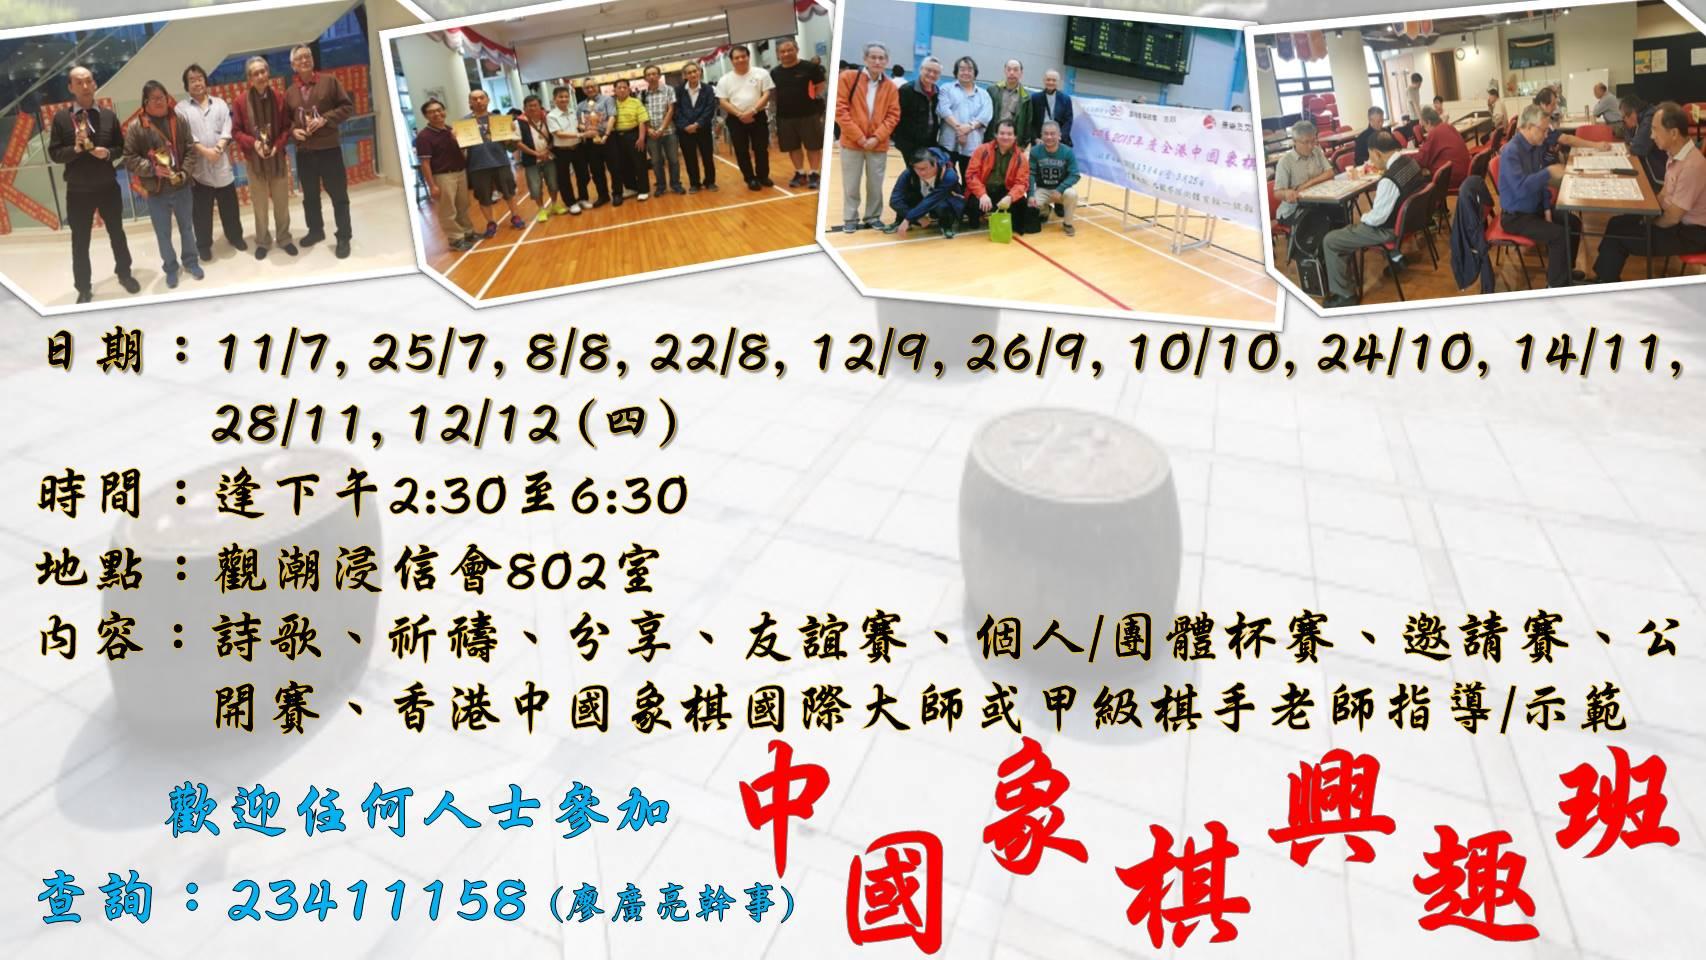 2019棋會宣傳Poster (16比9)_updated